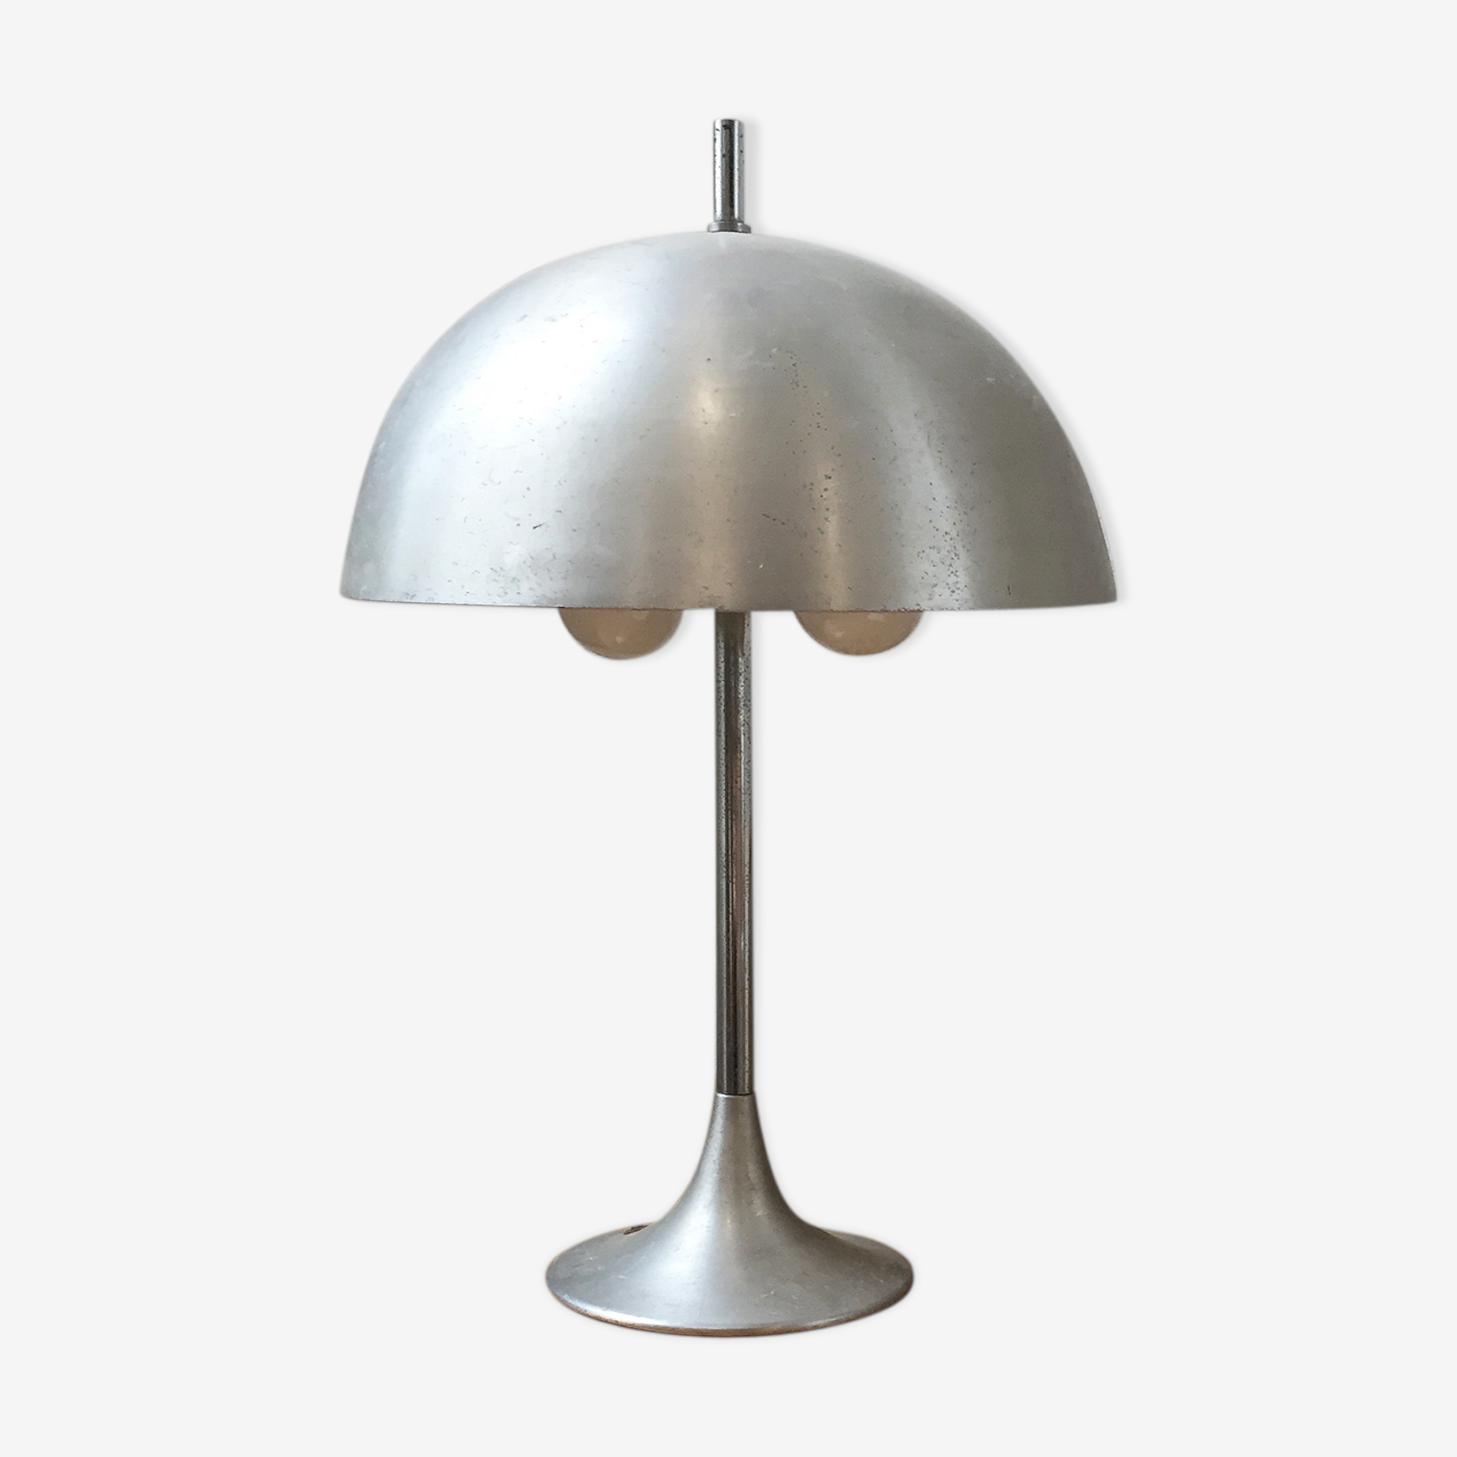 Lamp mushroom disderot